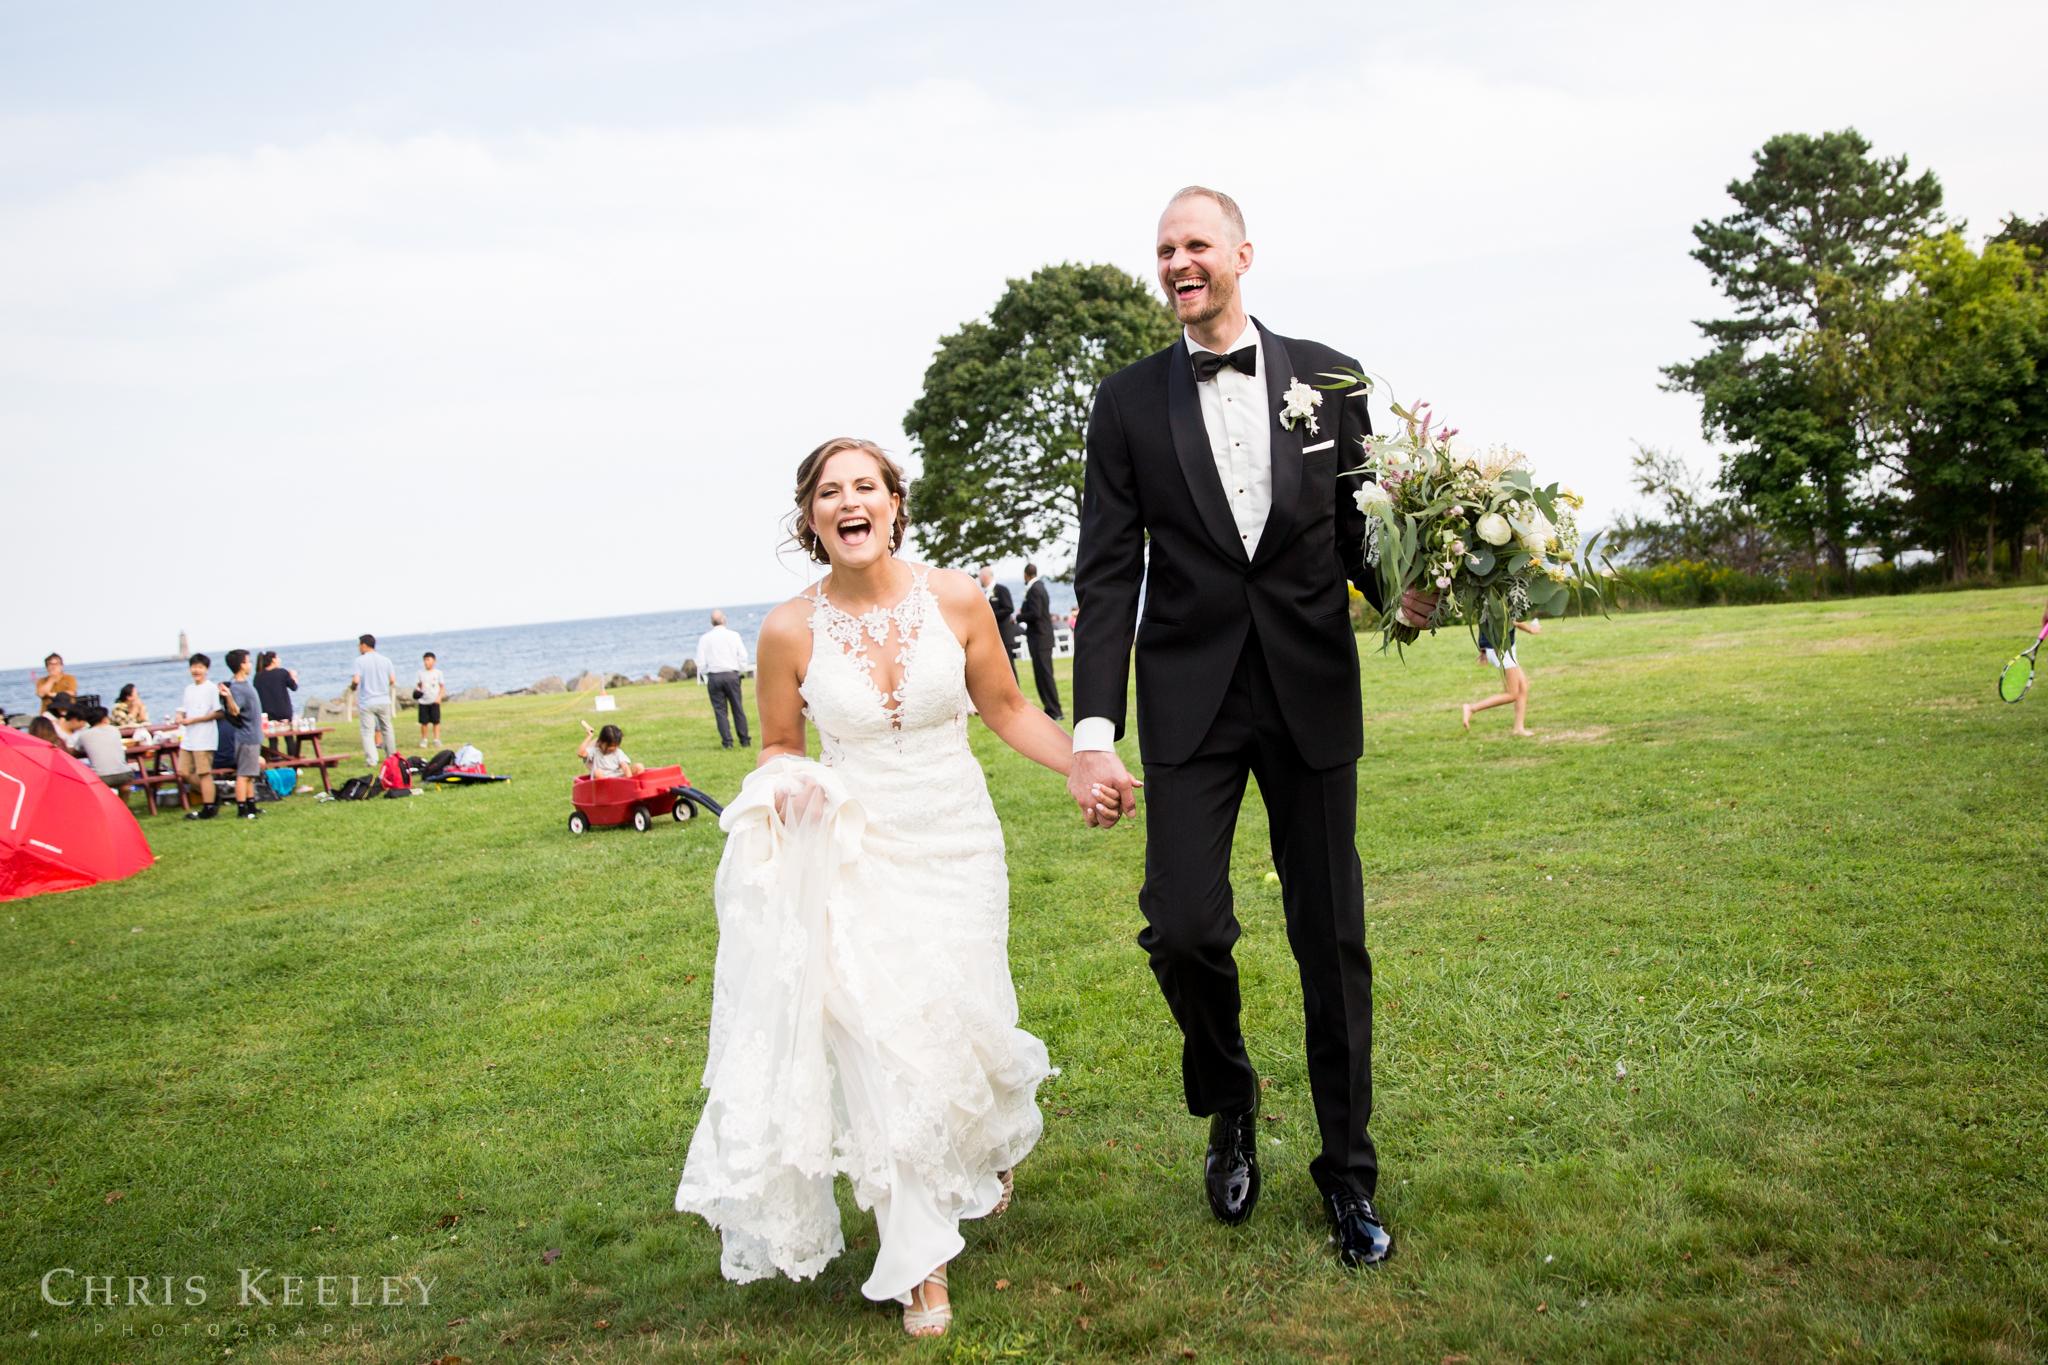 mombo-portsmouth-new-hampshire-wedding-photograper-43.jpg